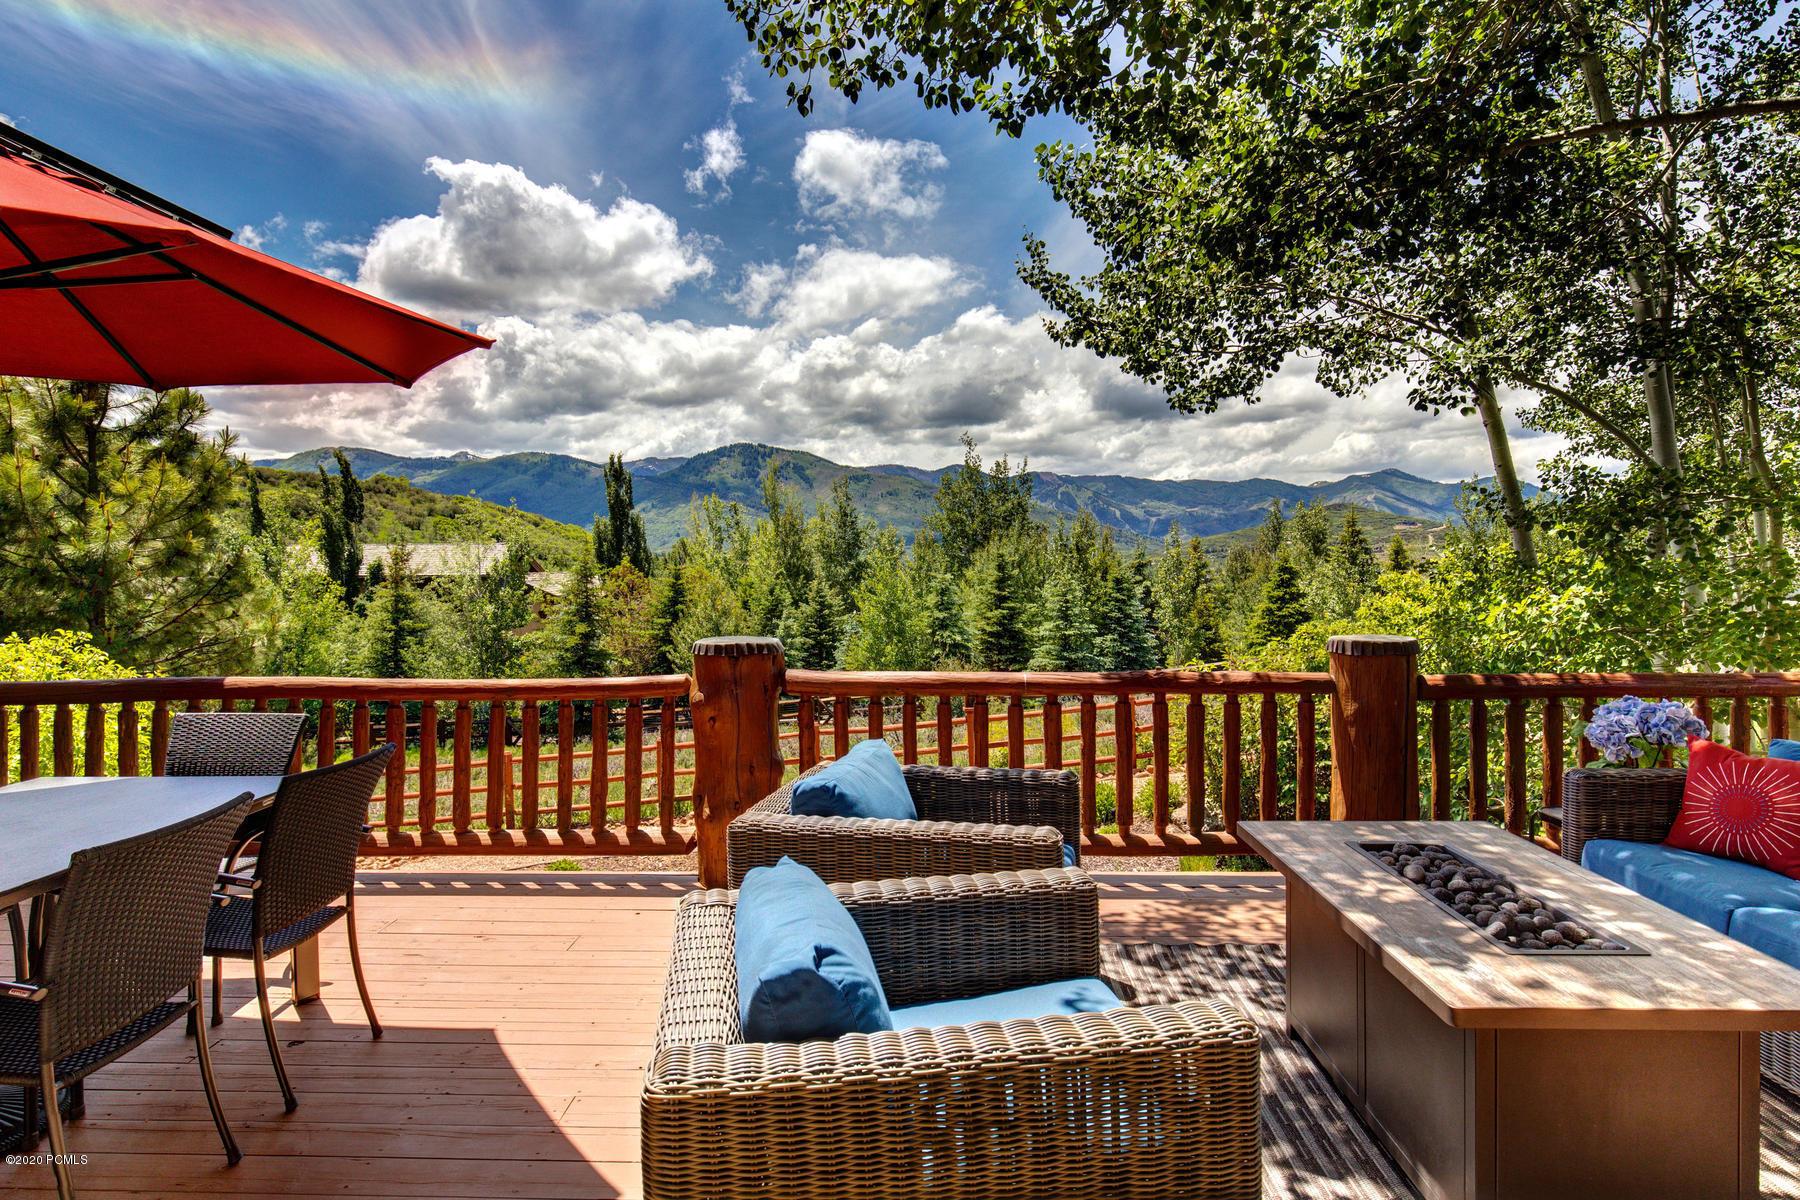 2575 Silver Cloud Drive, Park City, Utah 84060, 4 Bedrooms Bedrooms, ,5 BathroomsBathrooms,Single Family,For Sale,Silver Cloud,20190109112430415765000000